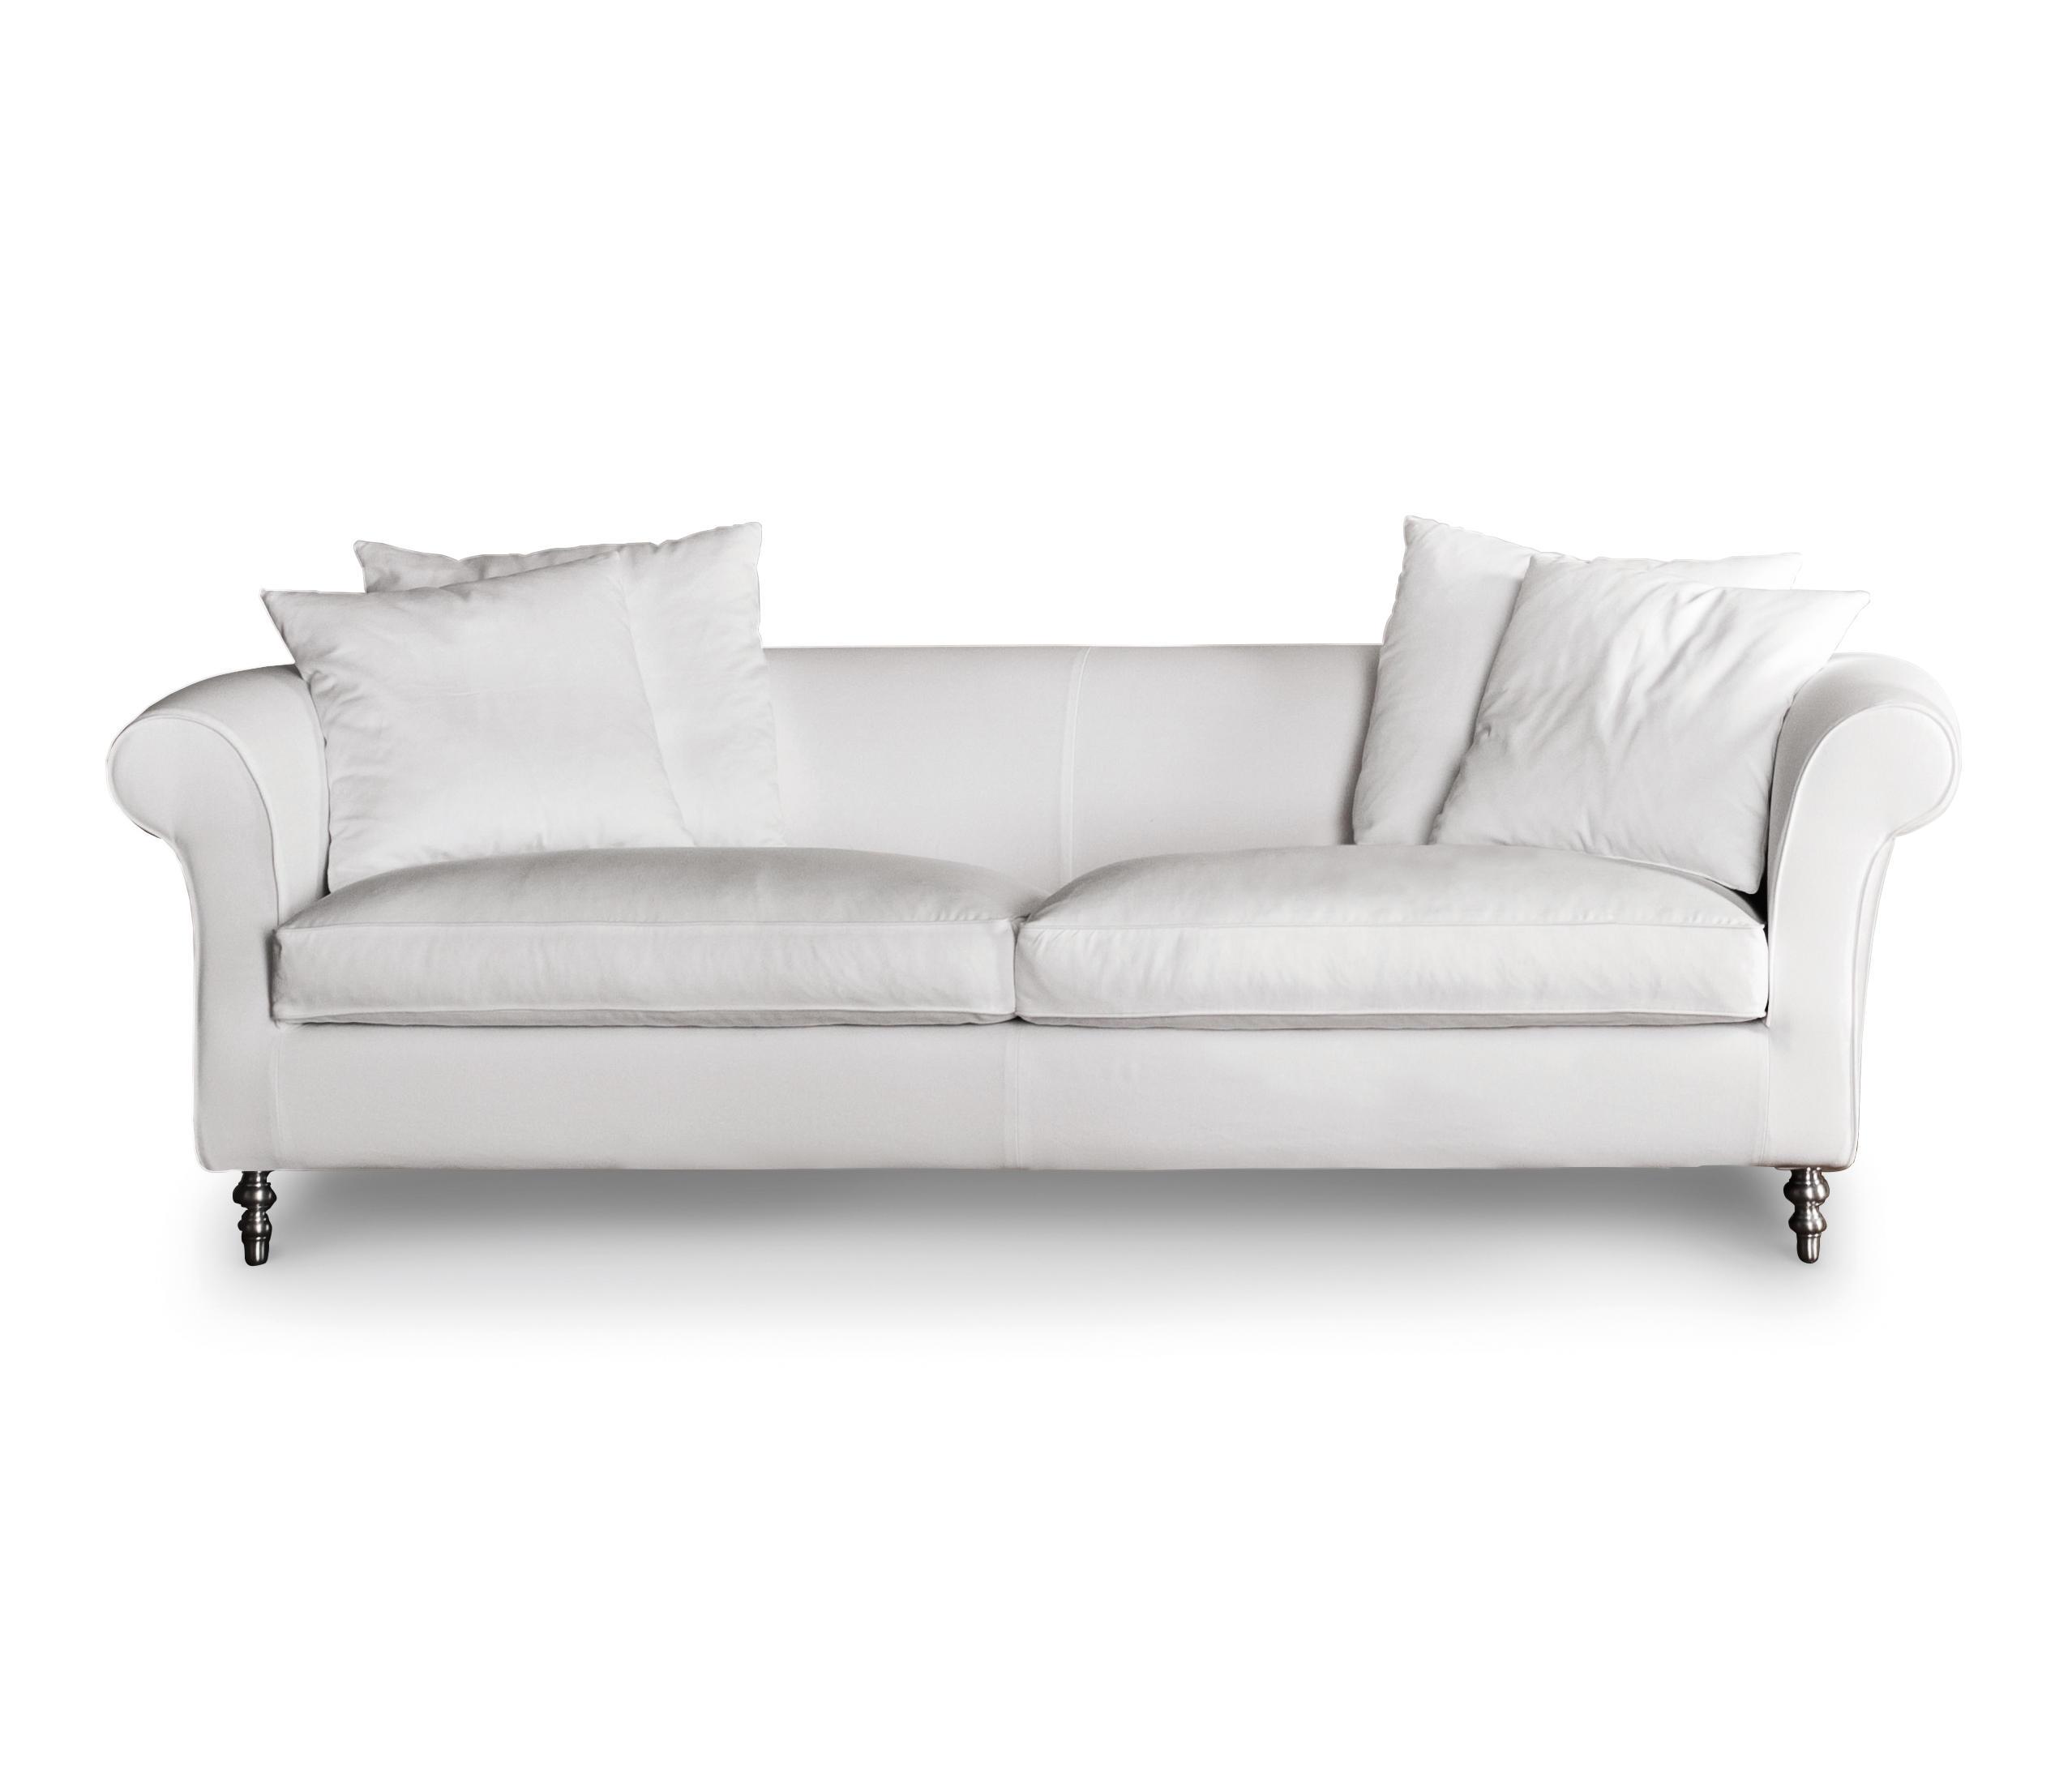 opium sofa canap s d 39 attente de saba italia architonic. Black Bedroom Furniture Sets. Home Design Ideas